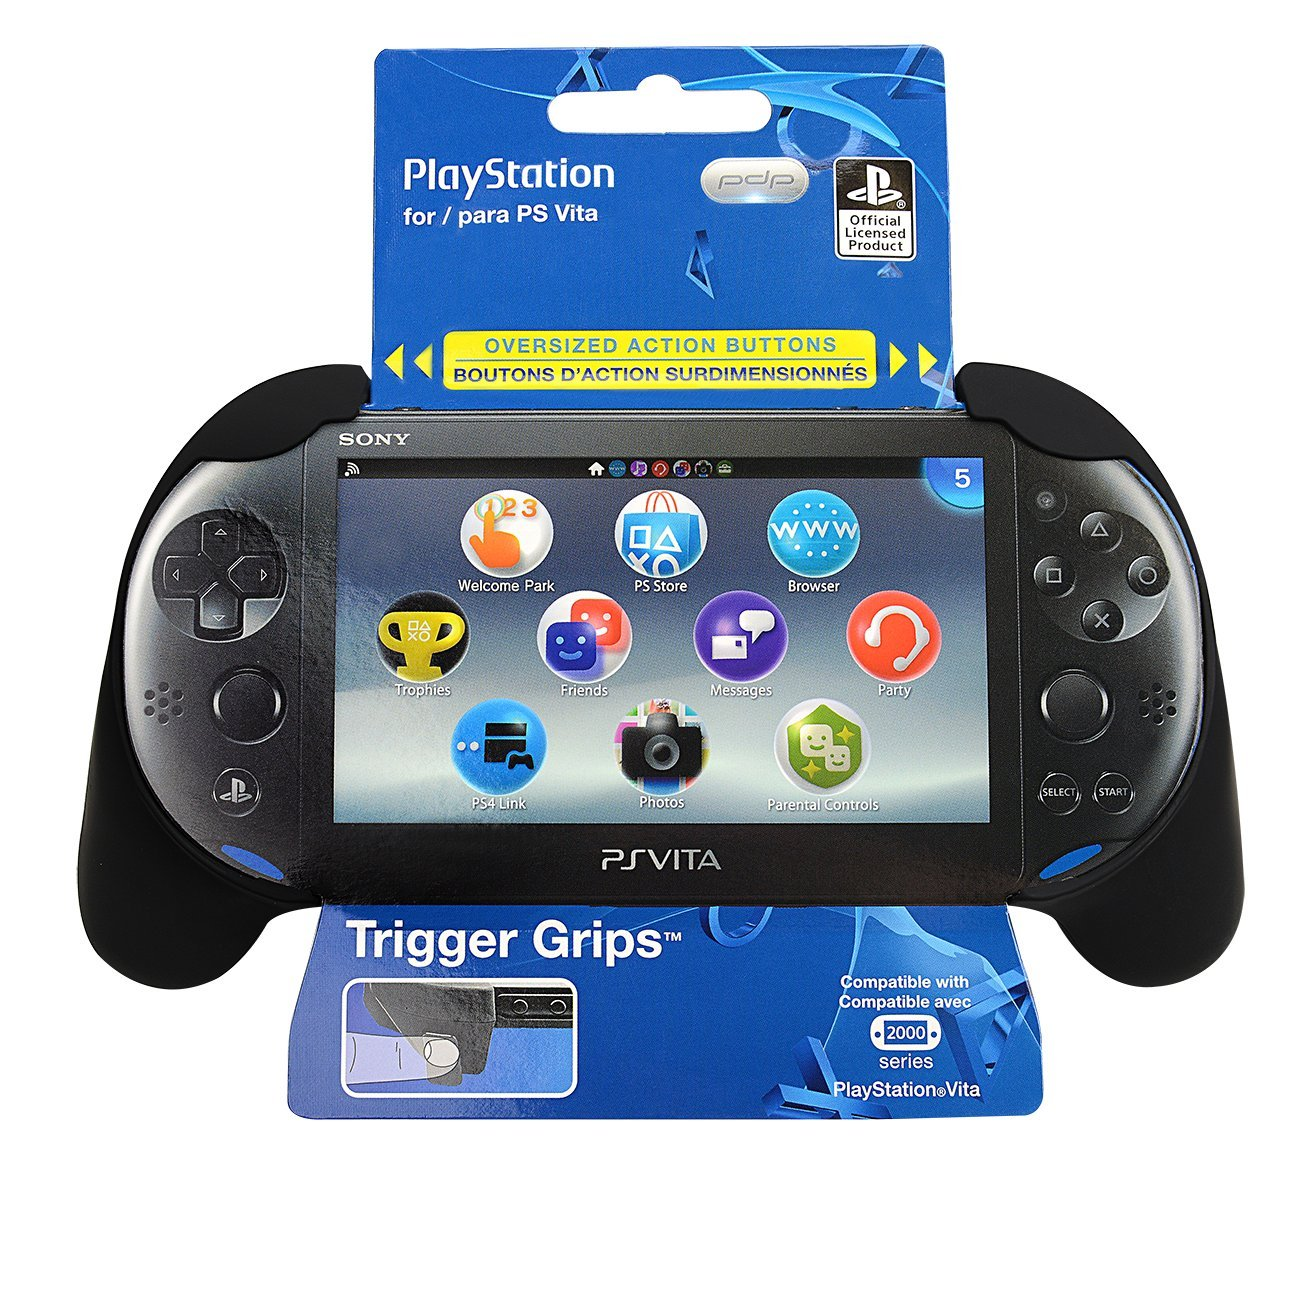 PS Vita 2000 Trigger Grip - Black by PDP (Image #2)